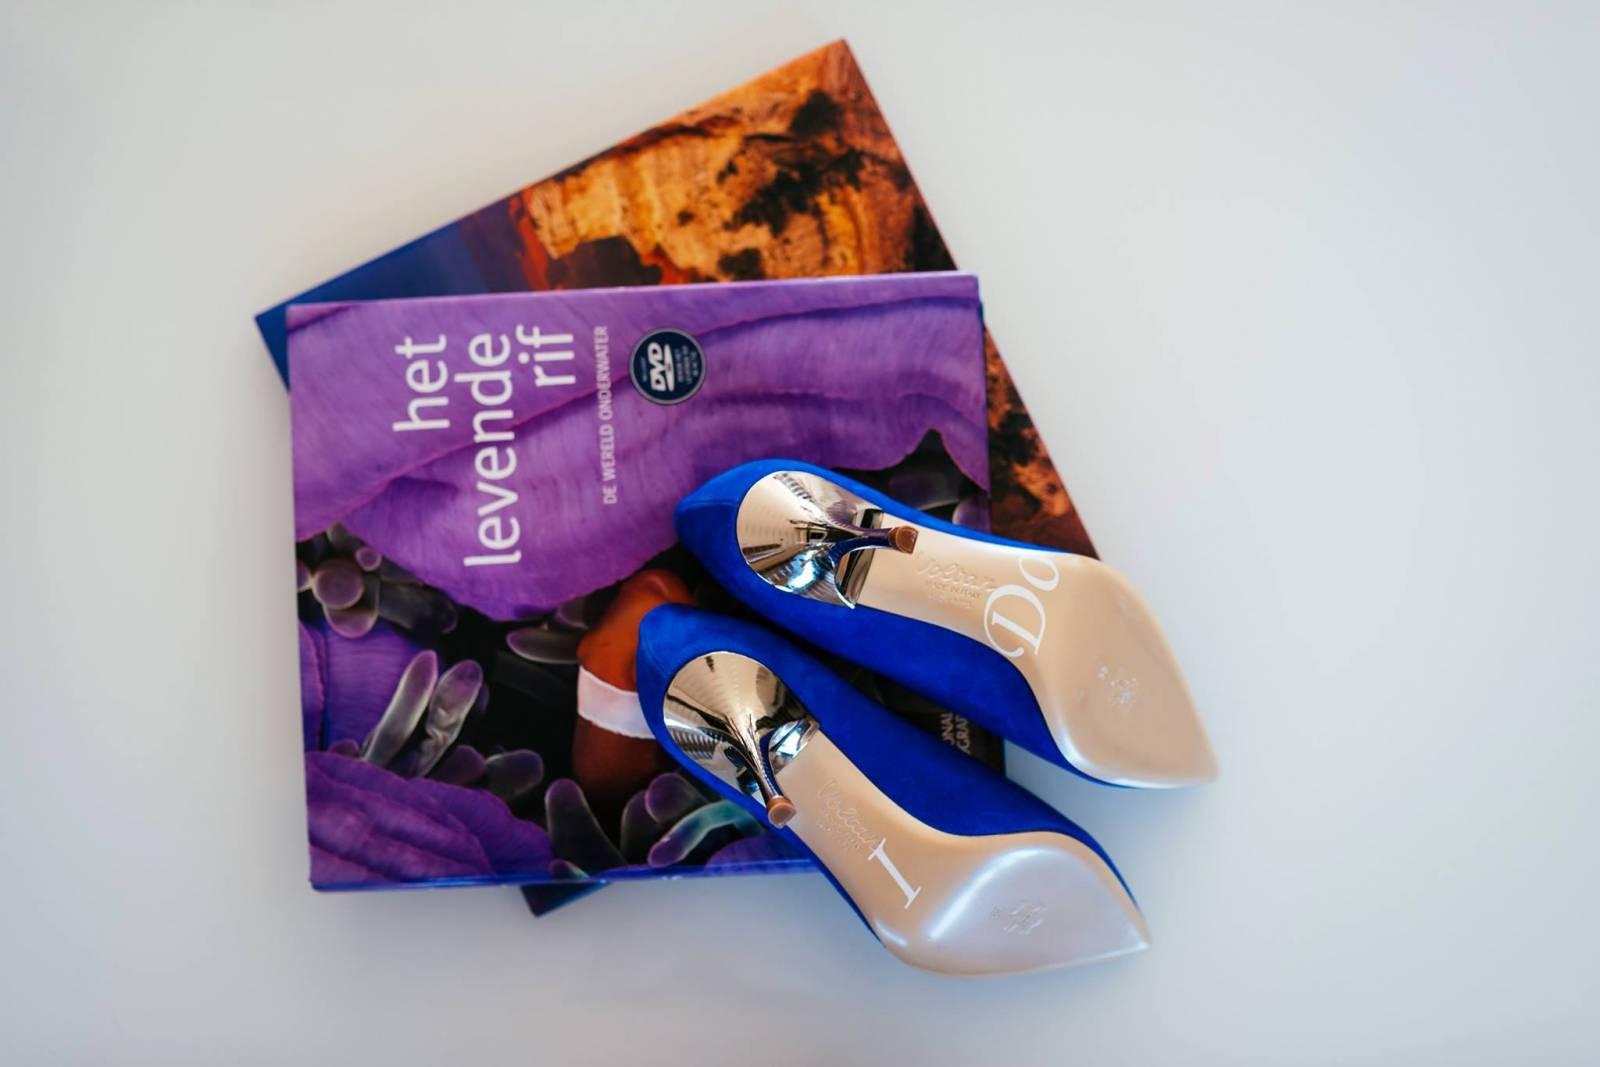 Excellence Weddings - House of Weddings - Stijn knaepen1